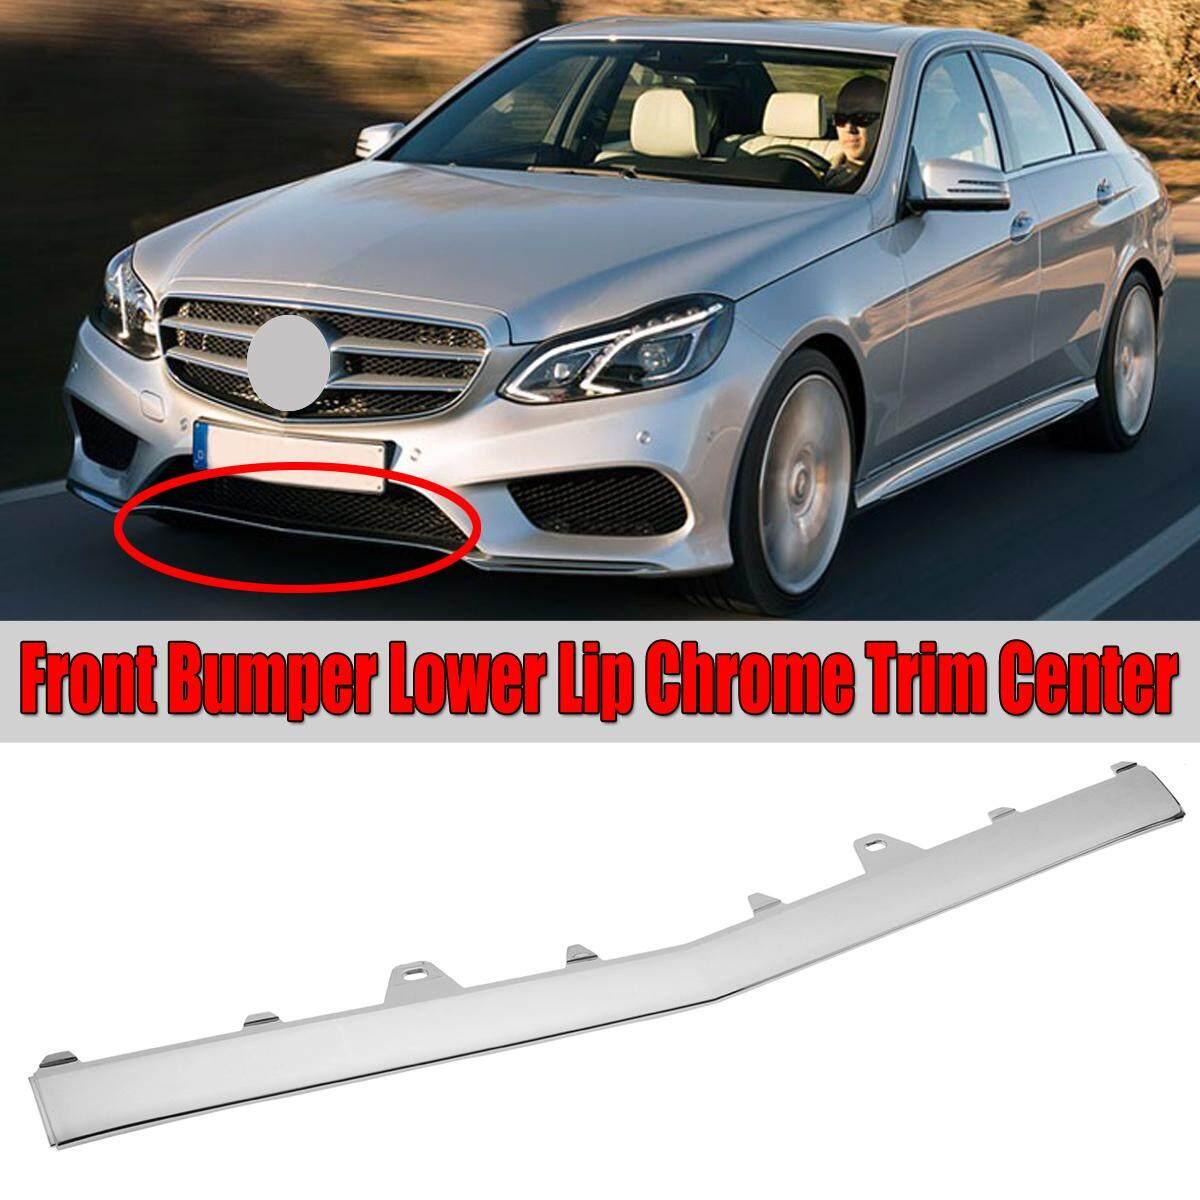 Set of 3 Lower Front Bumper Chrome Trim Molding for Mercedes W212 E350 2014-2016